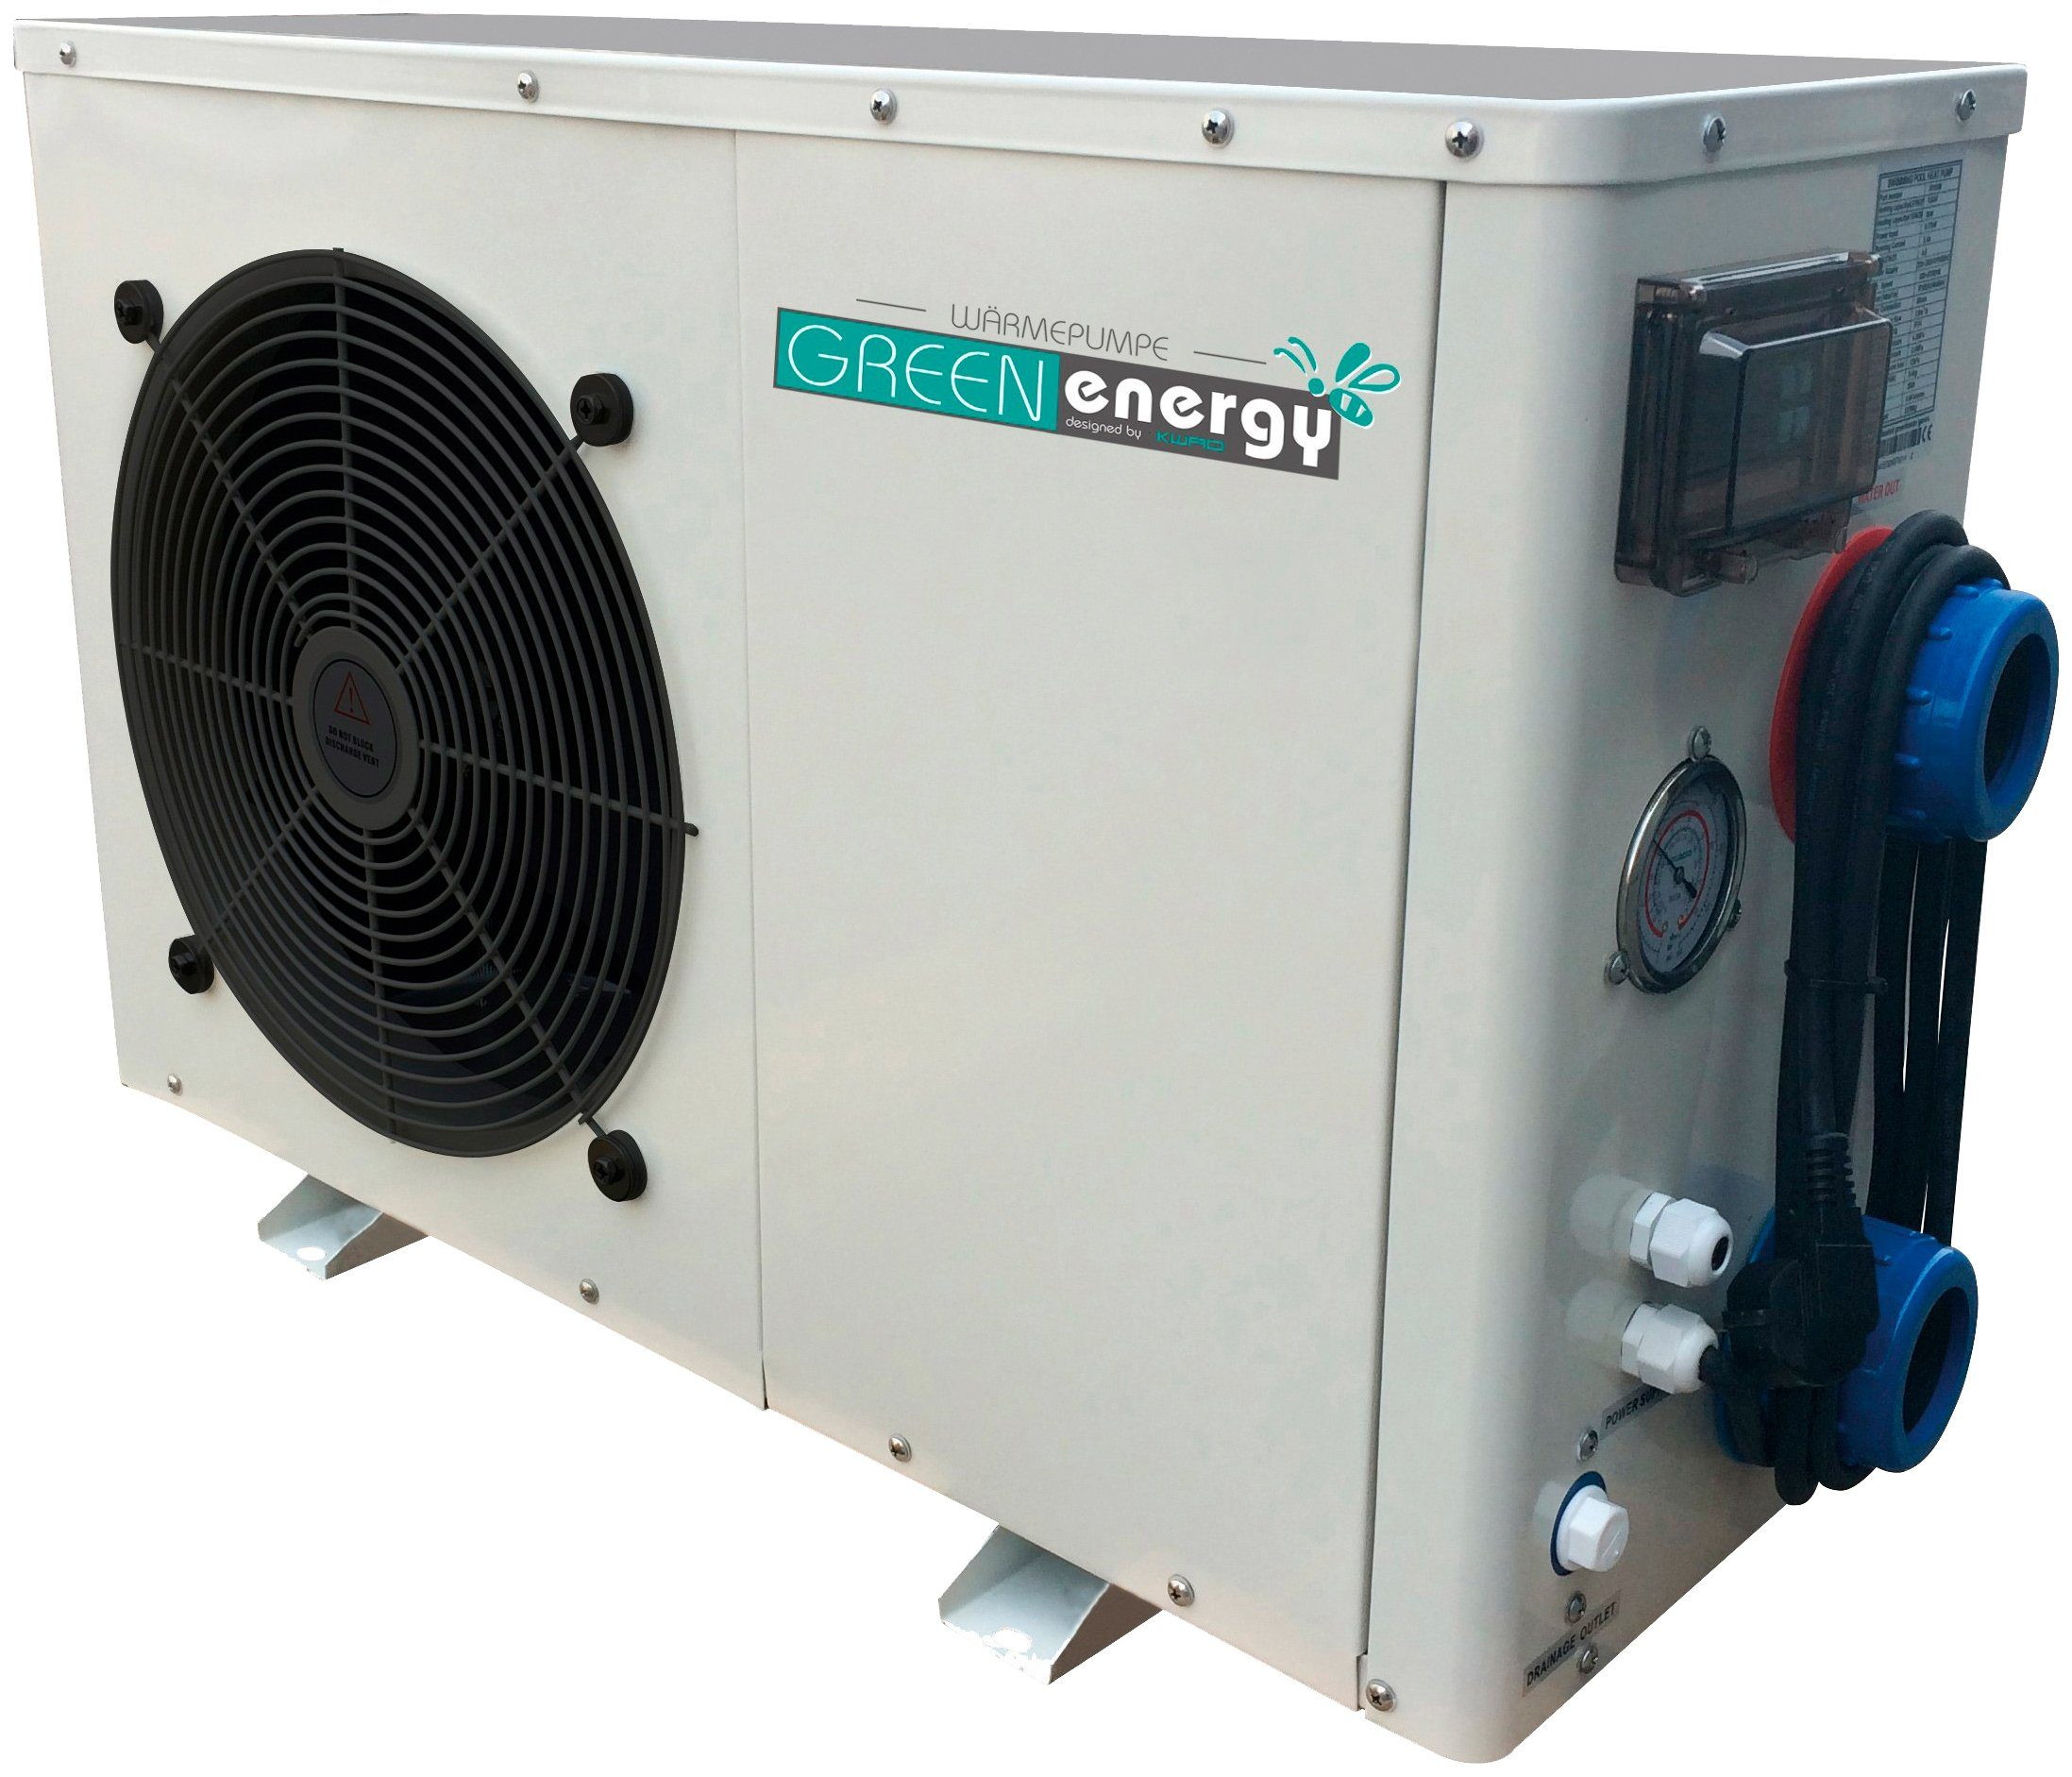 KWAD Wärmepumpen »Green Energy 12«, für Pools bis 60.000 l